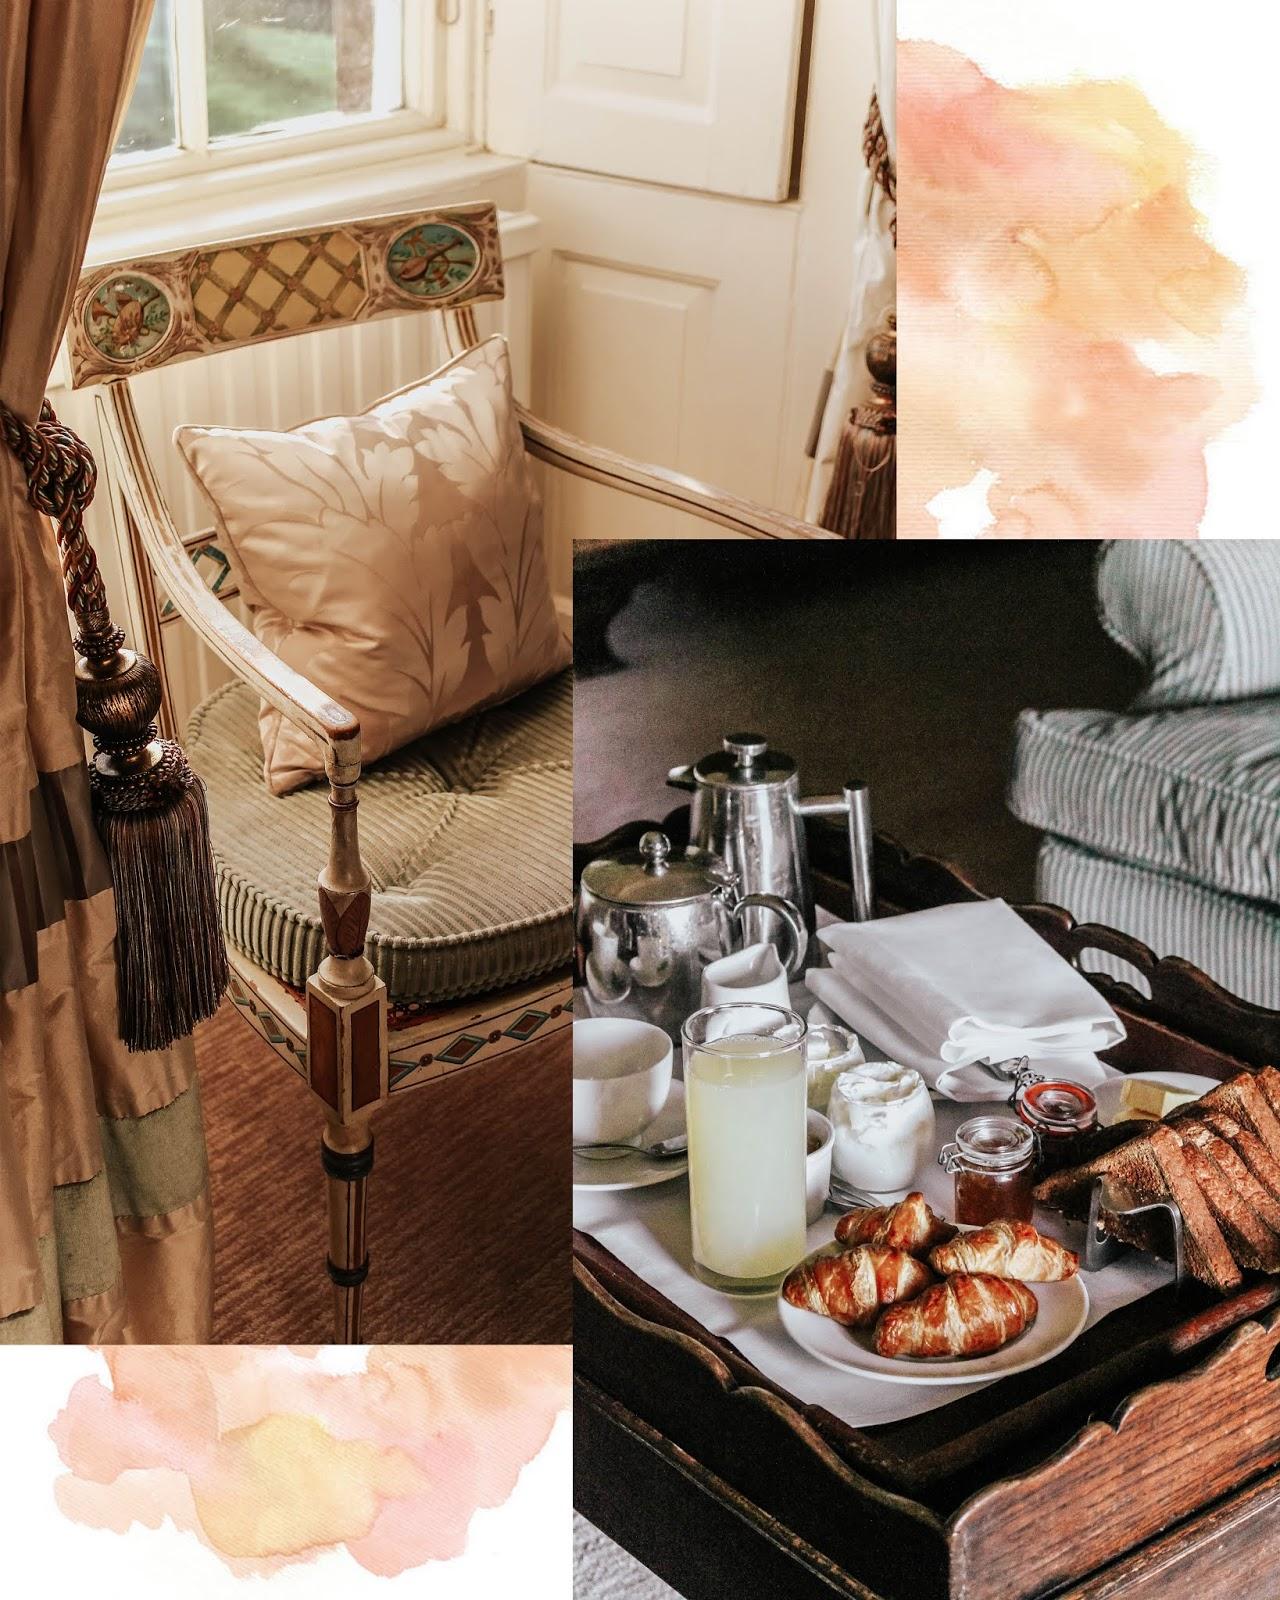 Ston Easton Park Hotel Room Service Tray Breakfast